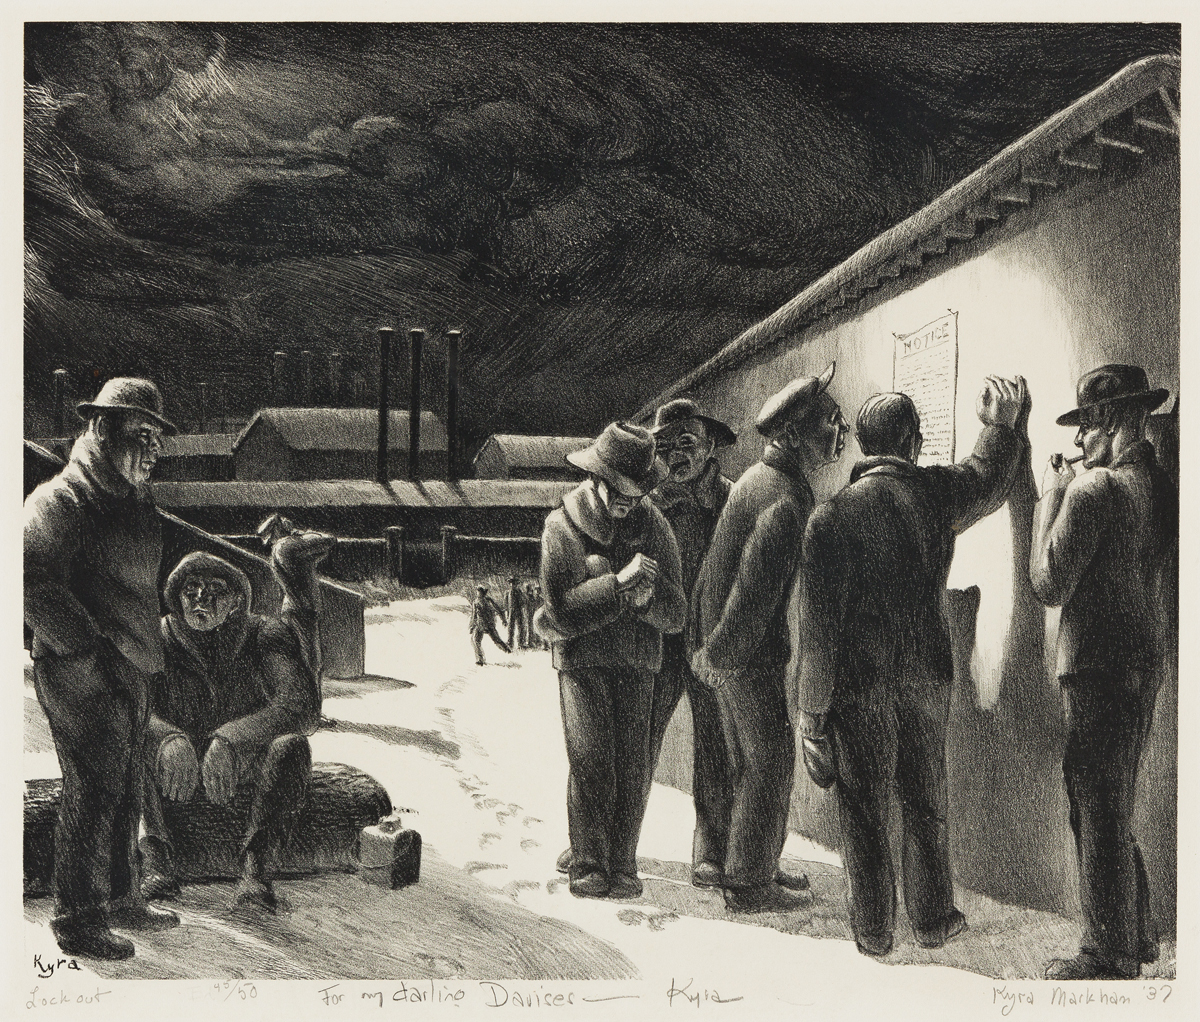 KYRA MARKHAM (1891-1967) Lockout.